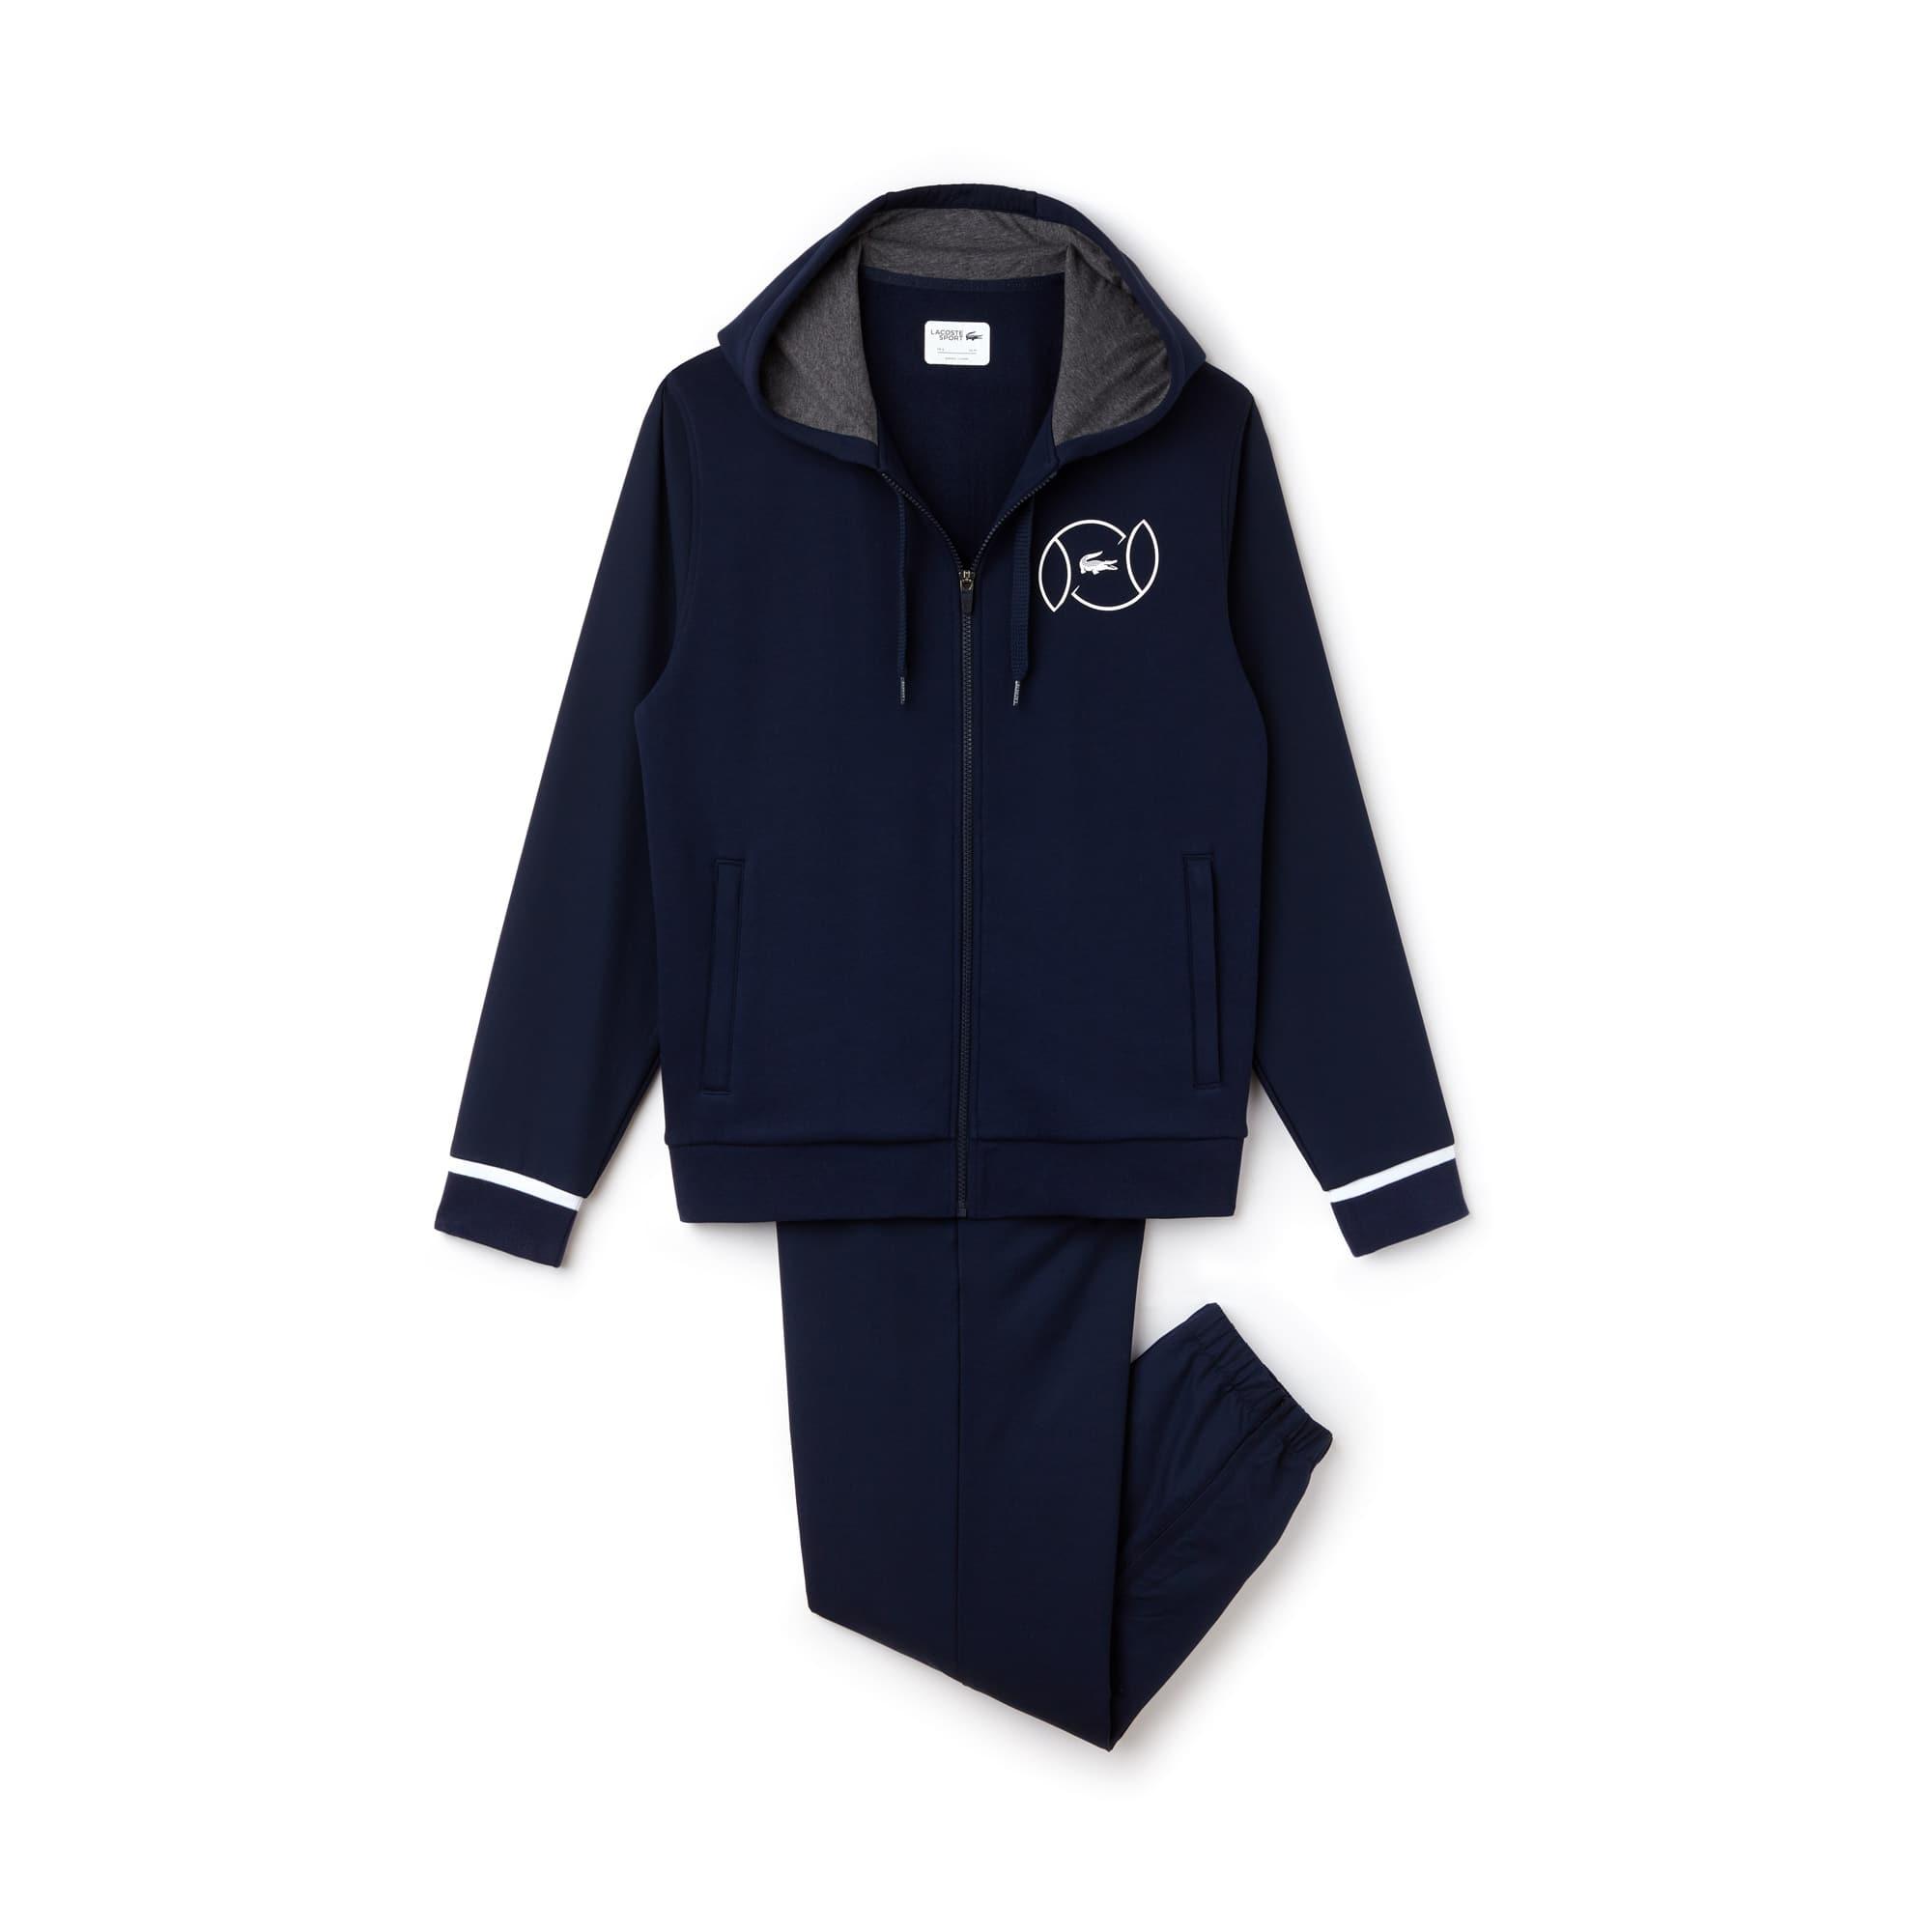 Herren LACOSTE SPORT Fleece und Taft Tennis-Trainingsanzug